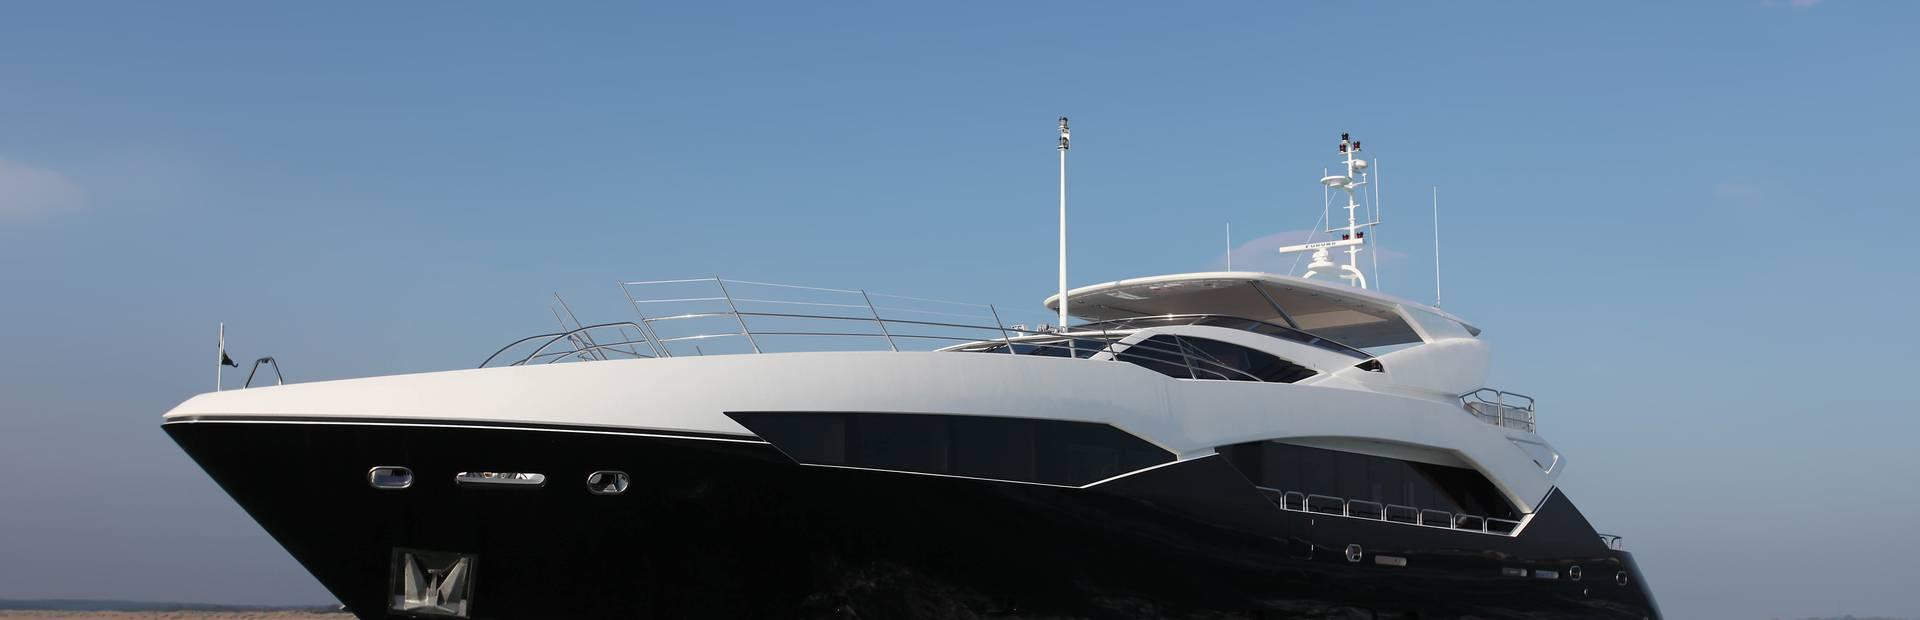 115 Sport Yacht Yacht Charter